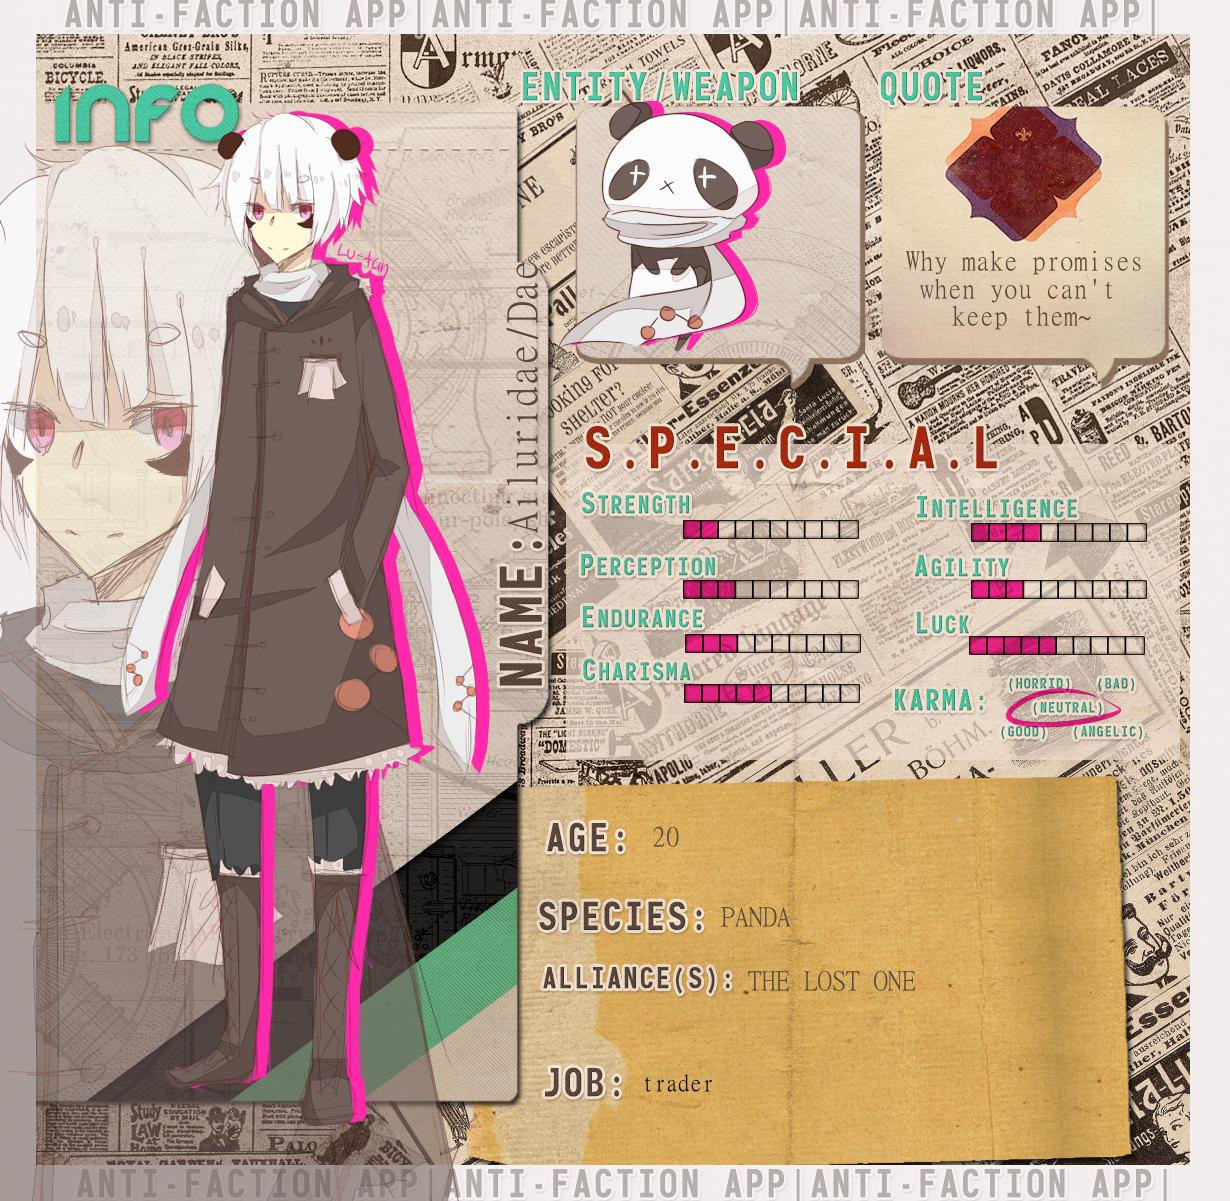 Anti Faction Application Sheet - DAE by Lu-tan